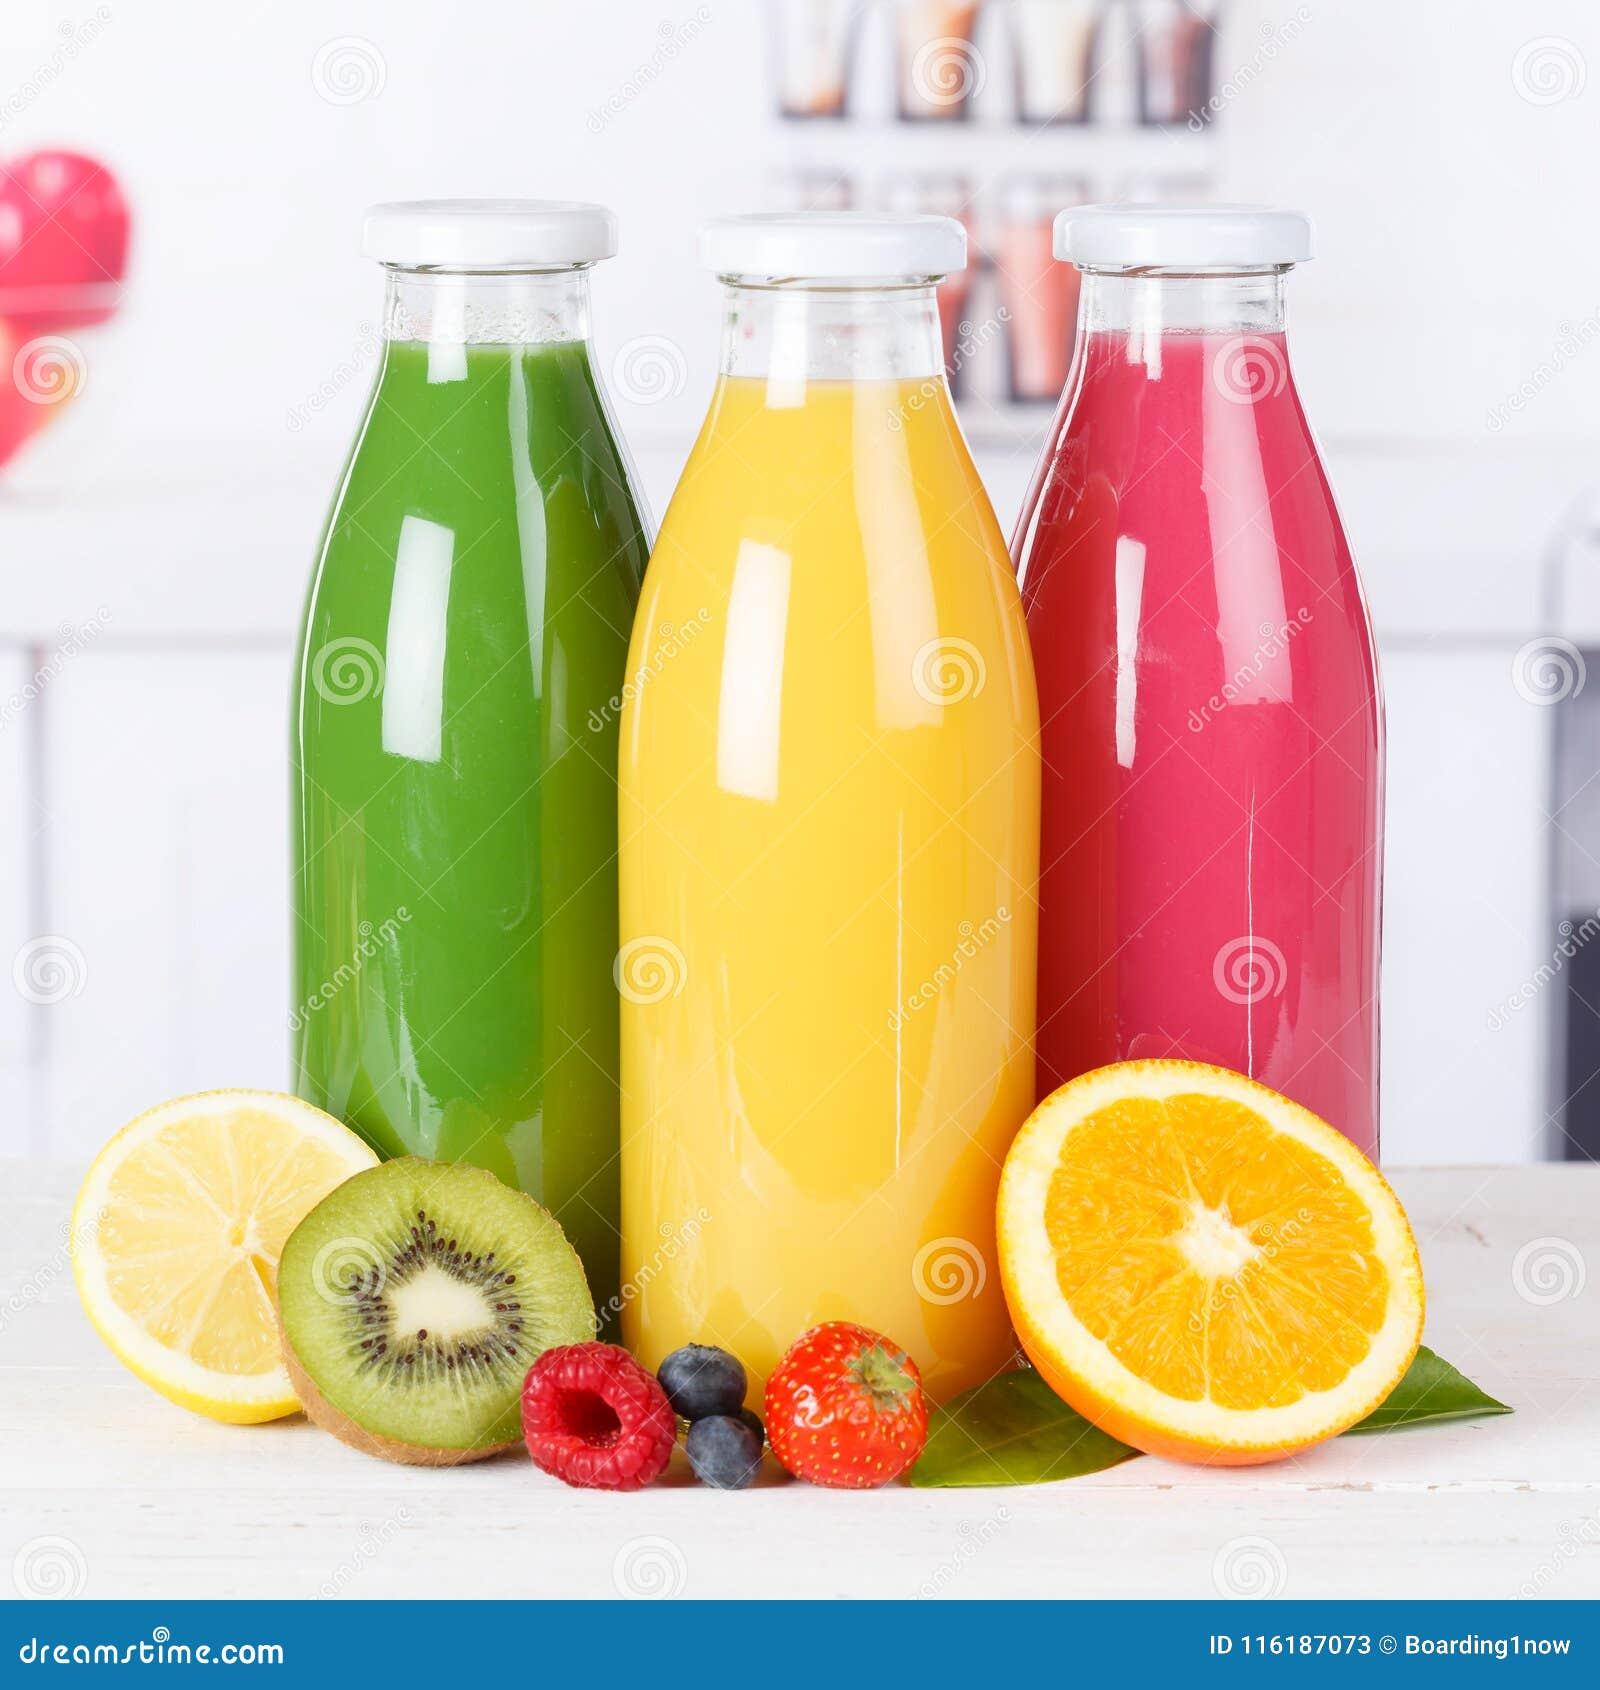 Juice smoothie orange smoothies in kitchen bottle square fruit f